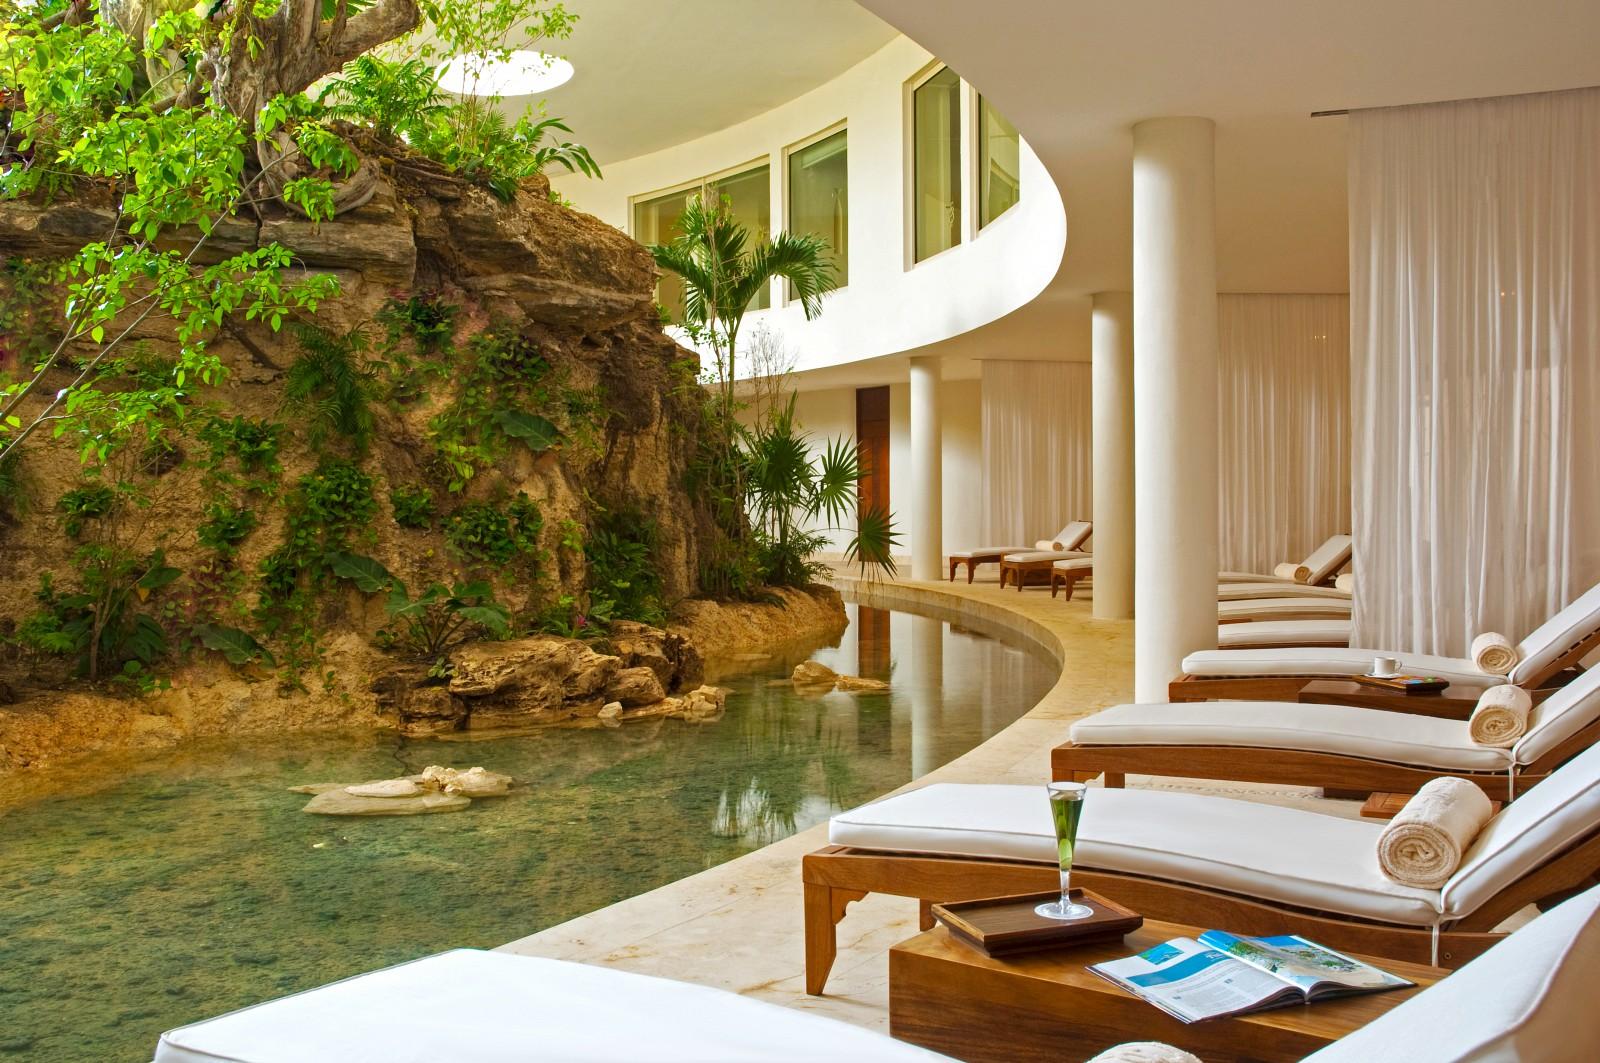 Travel Agency All-Inclusive Resort Grand Velas Riviera Maya 091